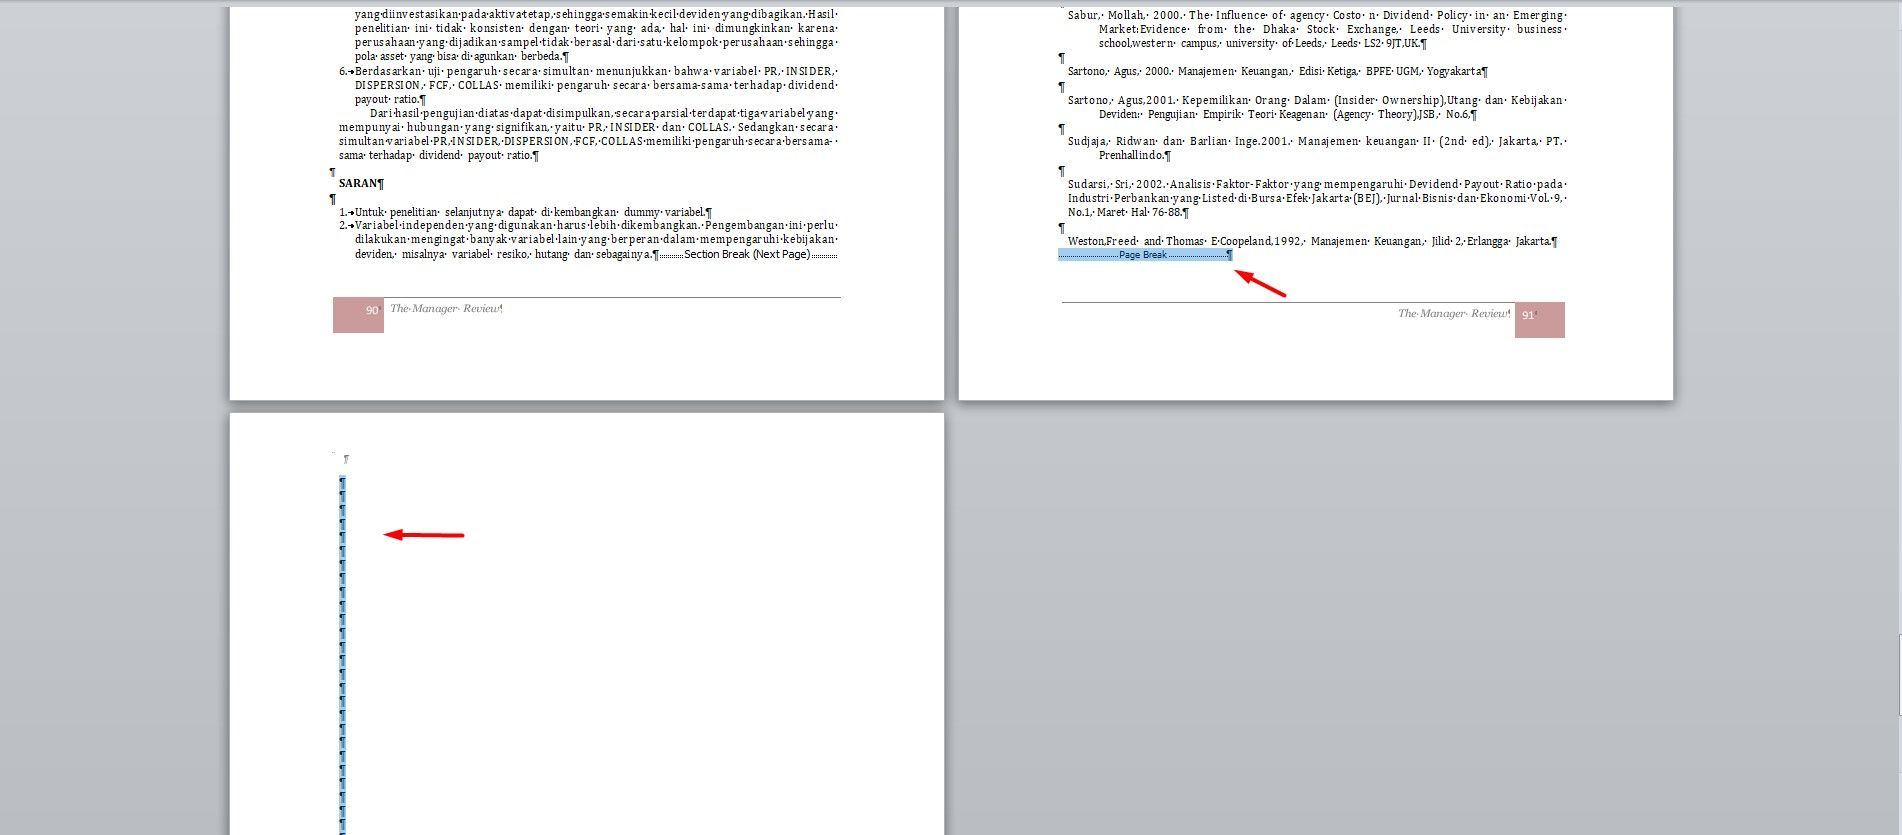 Pilih-Ctrl-End-untuk-mencapai-halaman-terakhir-pada-dokumen